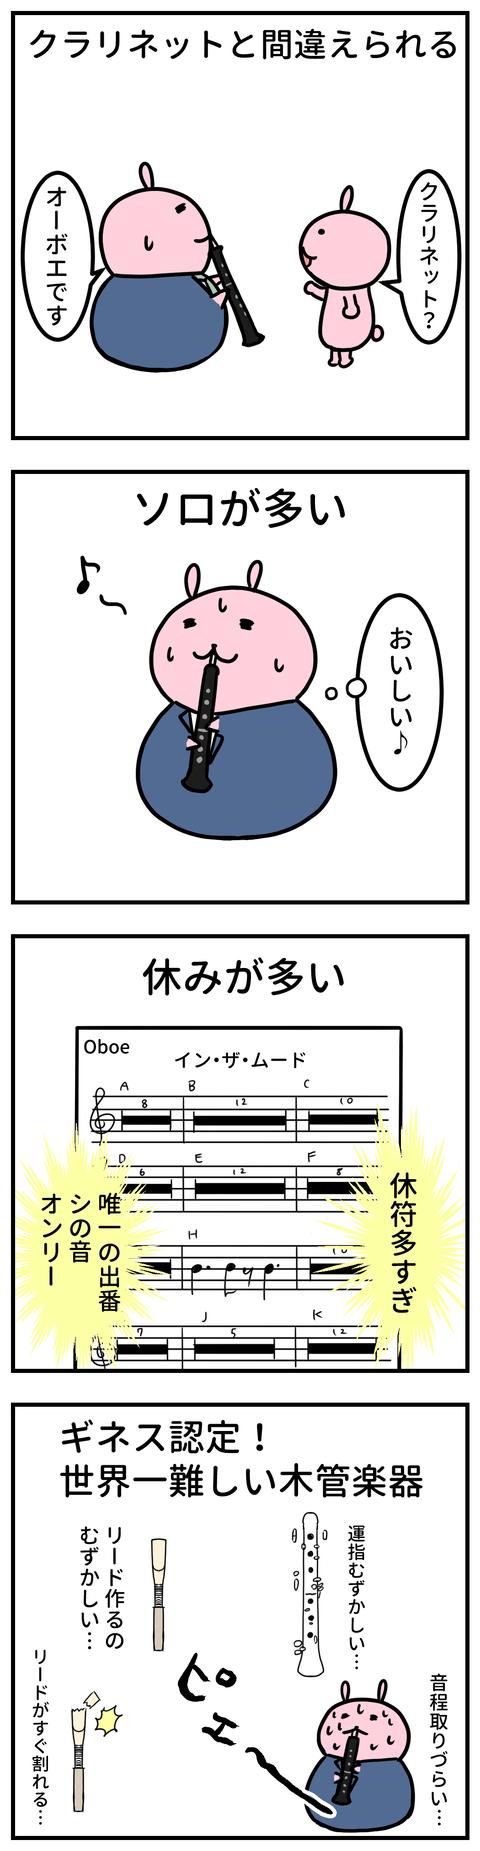 manga-yuzuporo34-1